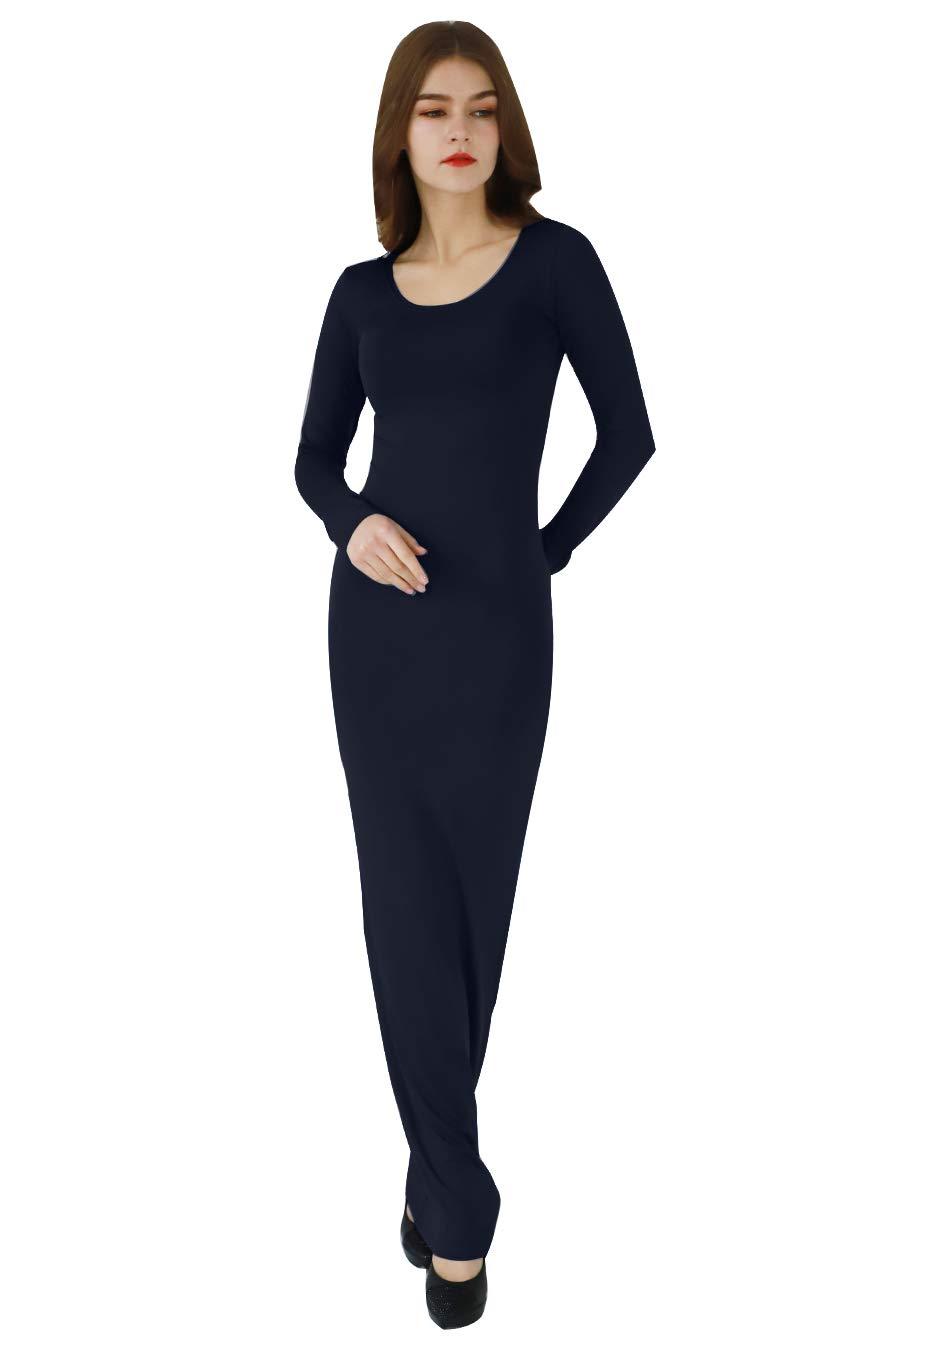 EFOFEI Womens Bodycon Slim Long Sleeve Causal Solid Club Maxi Long Dress